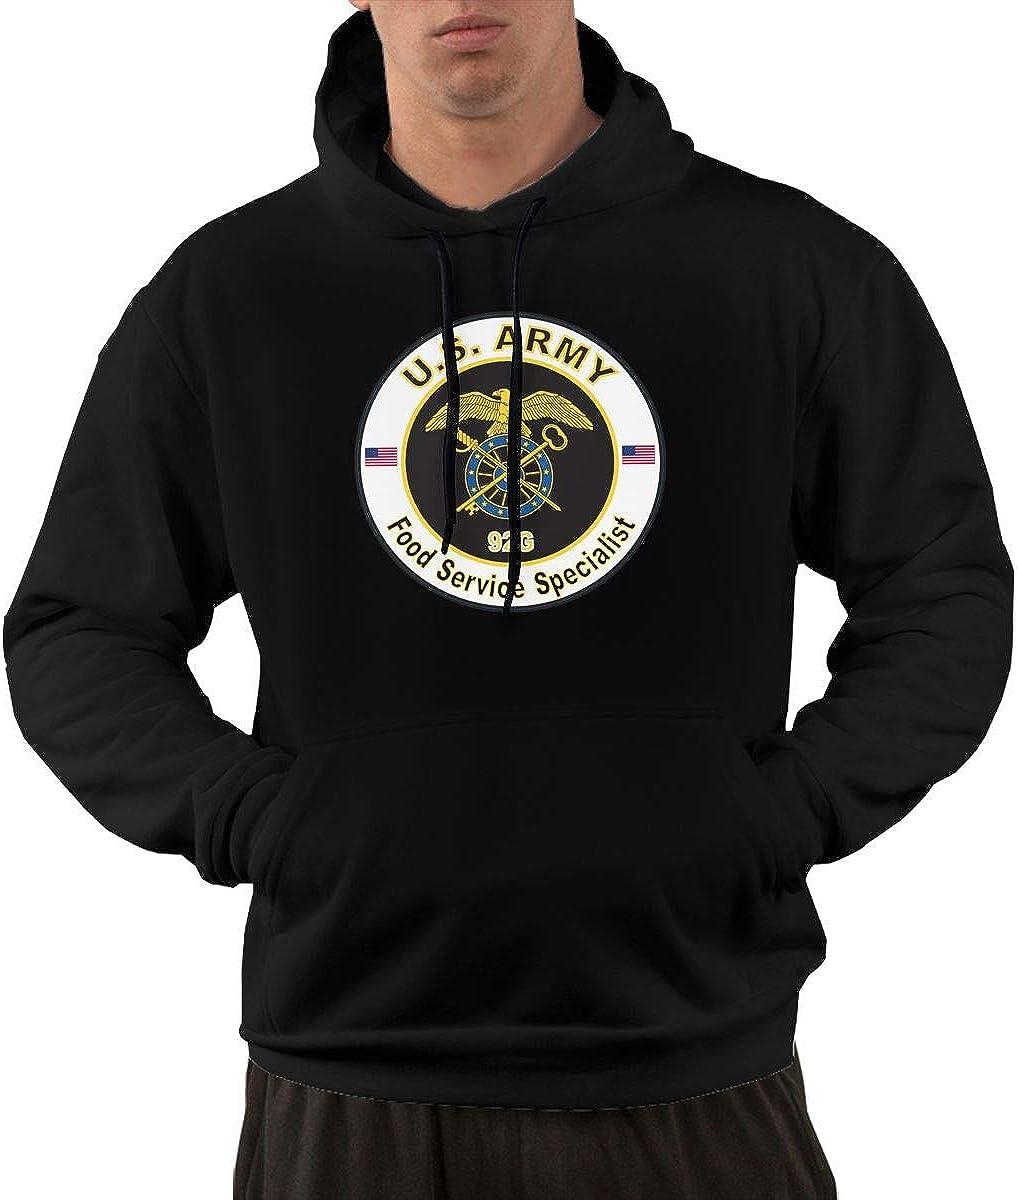 Army MOS 92G Food Service Specialist Men's Hoodie Sweatshirt Pullover Hoodie Casual Hoodie with Pockets